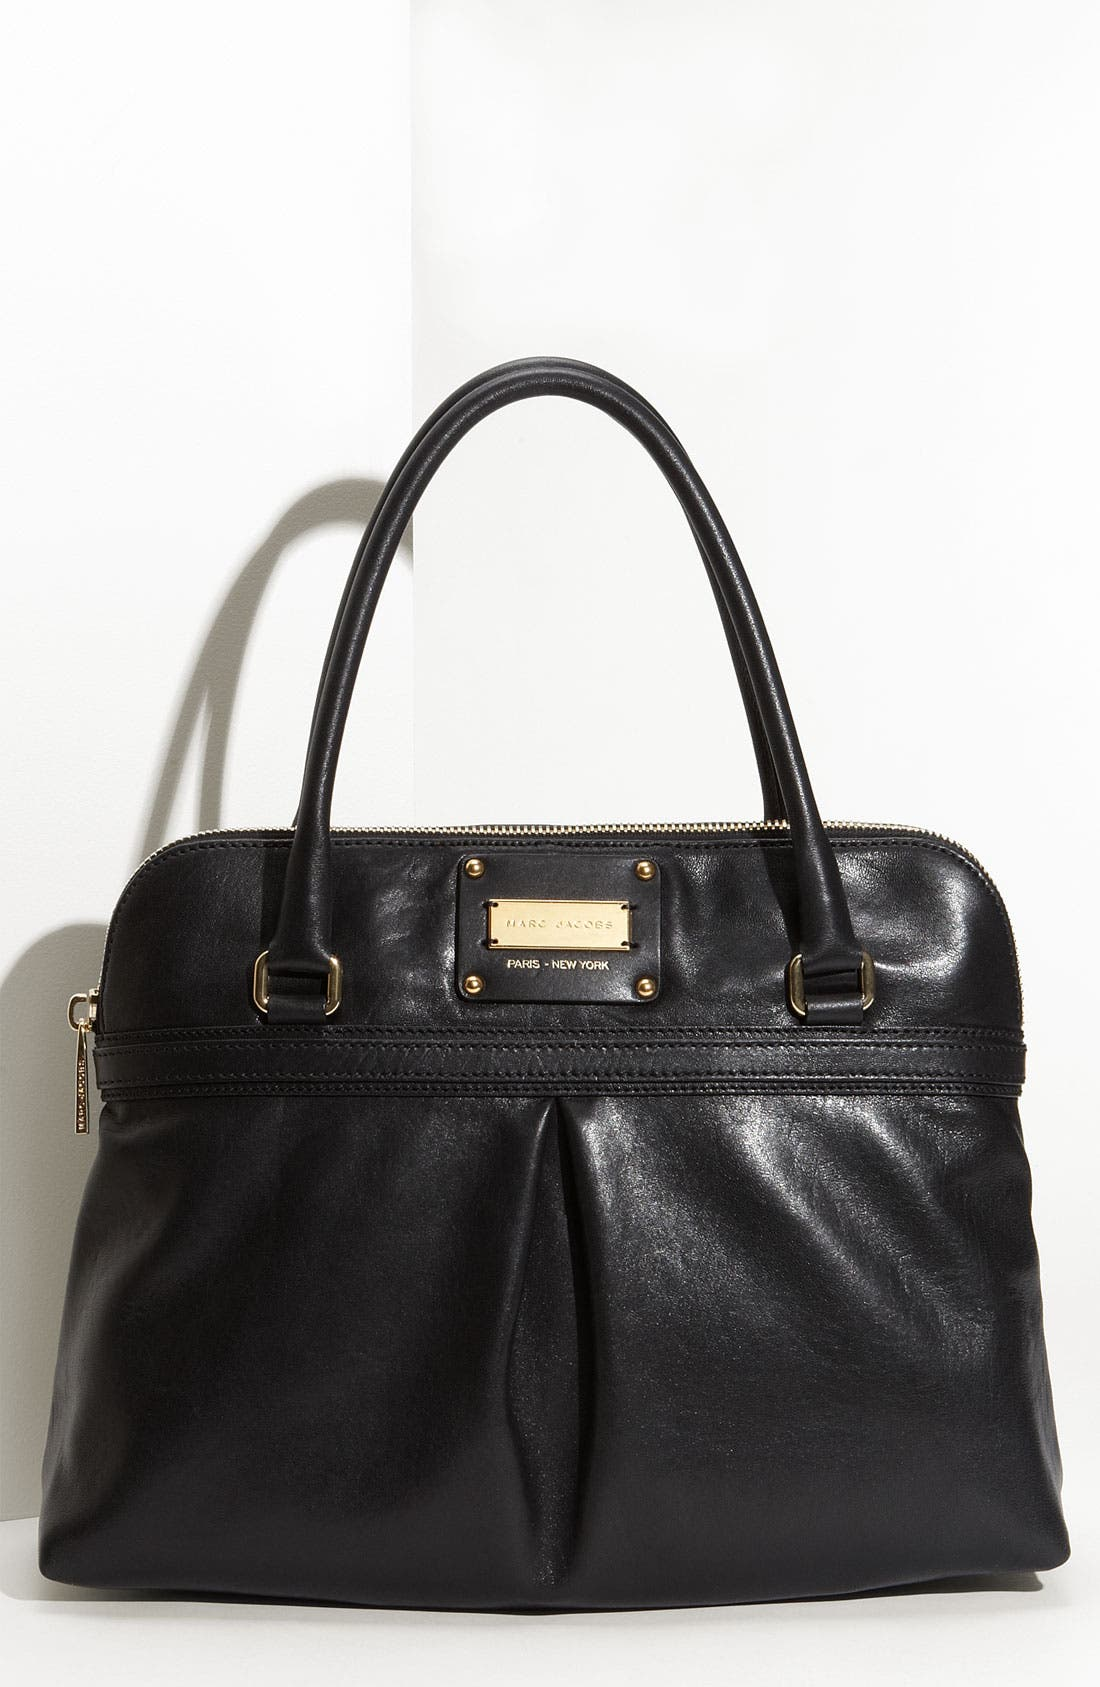 Alternate Image 1 Selected - MARC JACOBS 'Palais Royal - Jen' Shoulder Bag